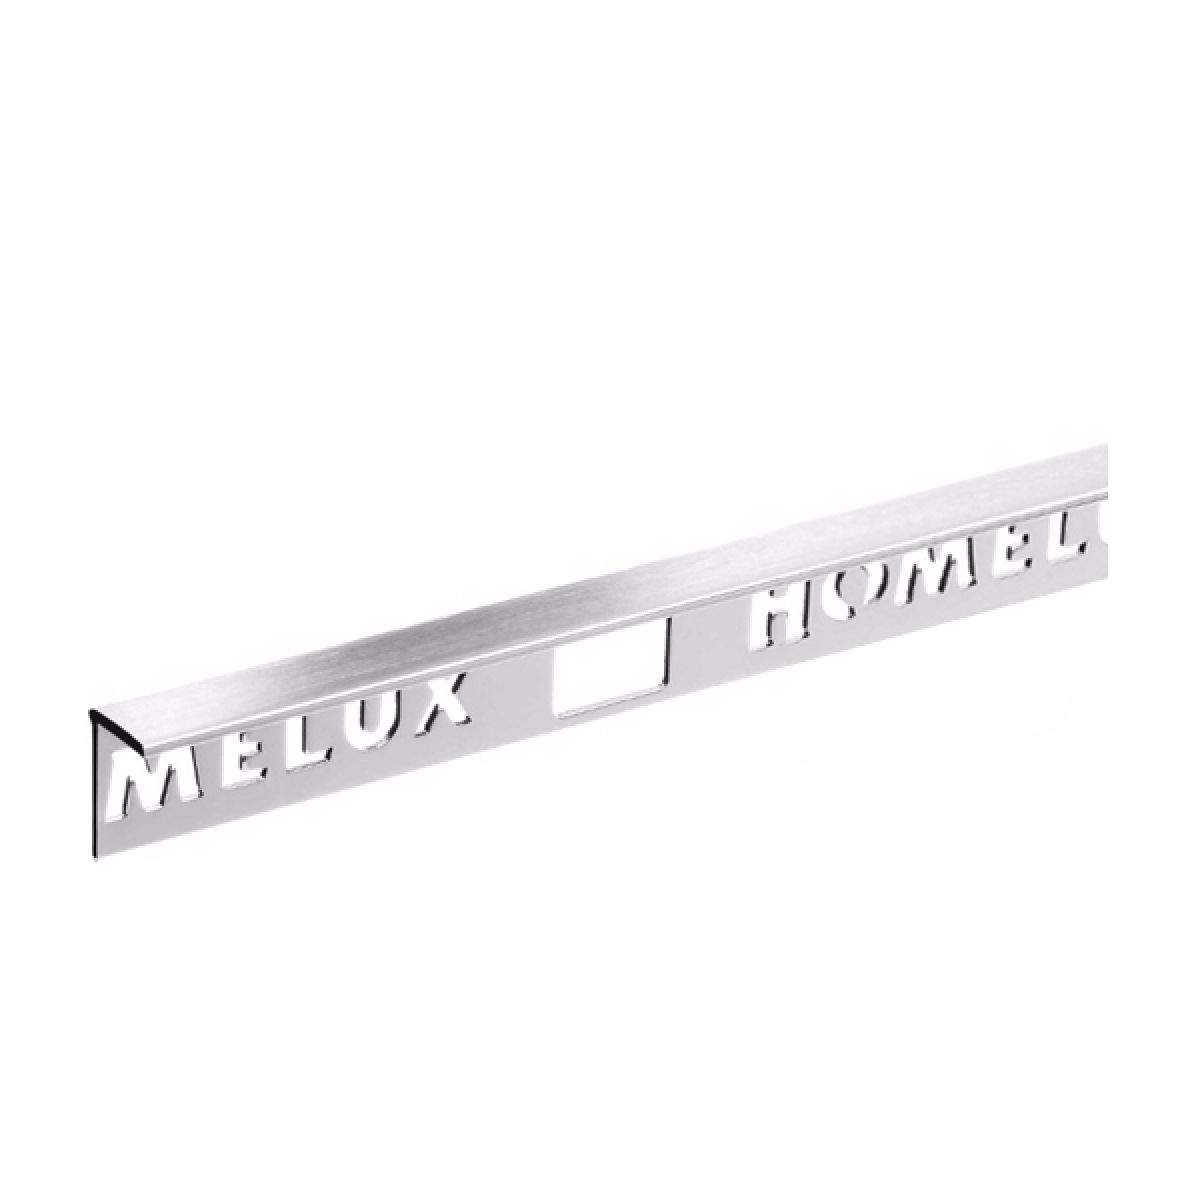 Homelux Aluminium Straight Edge 8mm Stainless Steel Tile Trim 2.5m